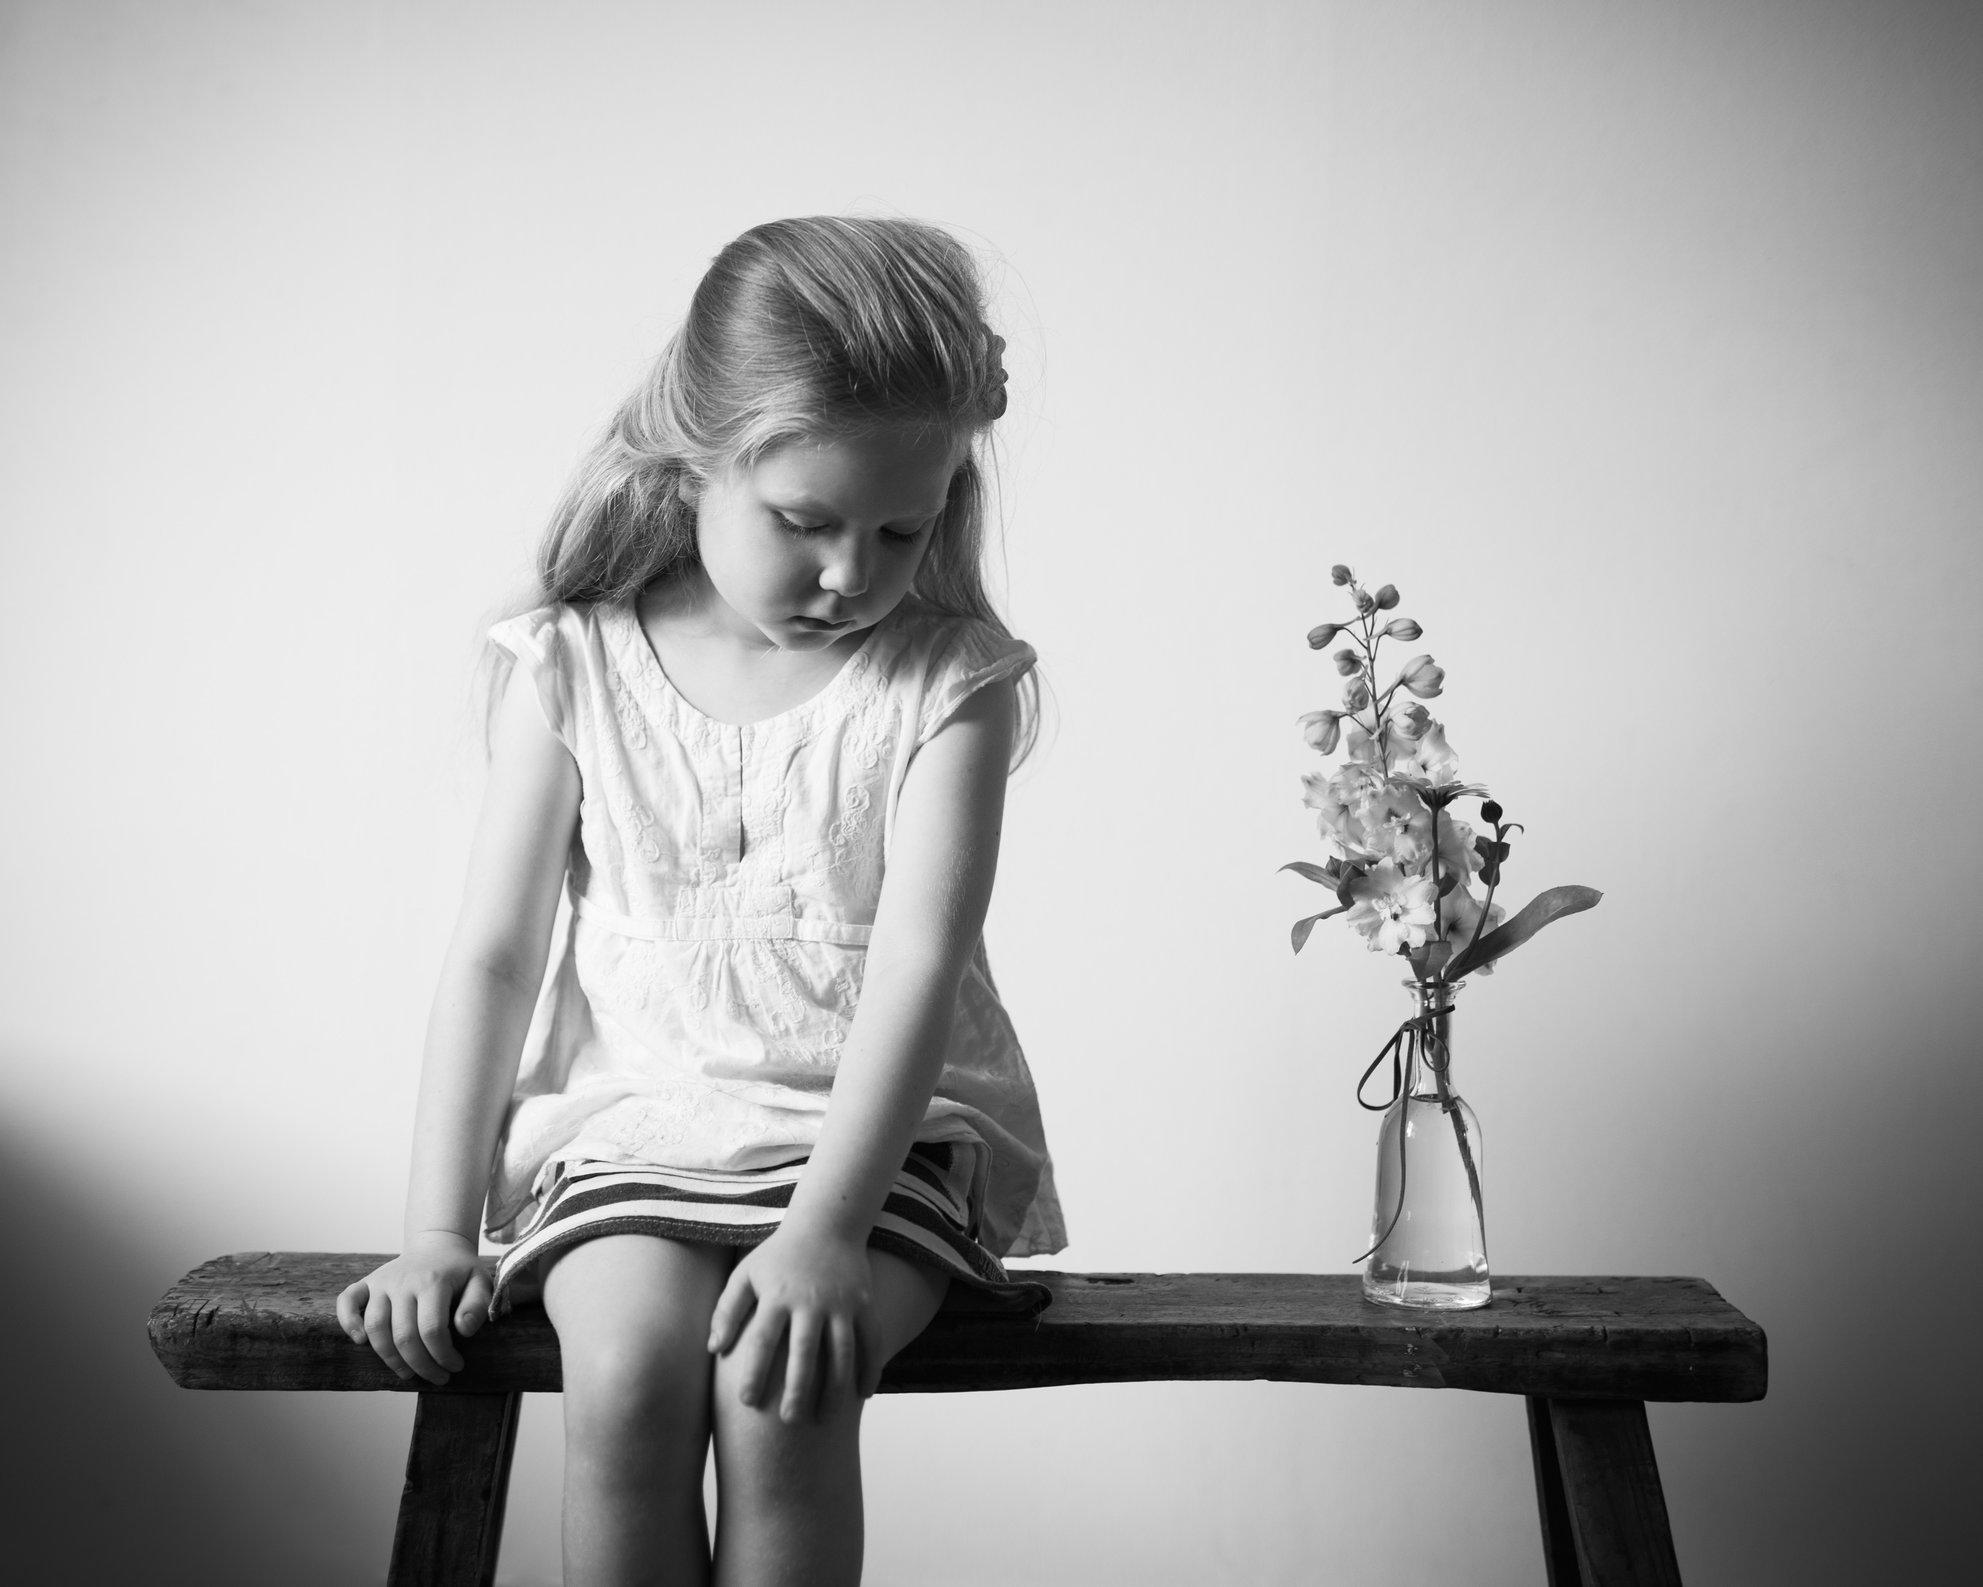 Portretfoto kind op bankje met vaasje bloemen - © Janneke Walter, kinderfotograaf omgeving Utrecht